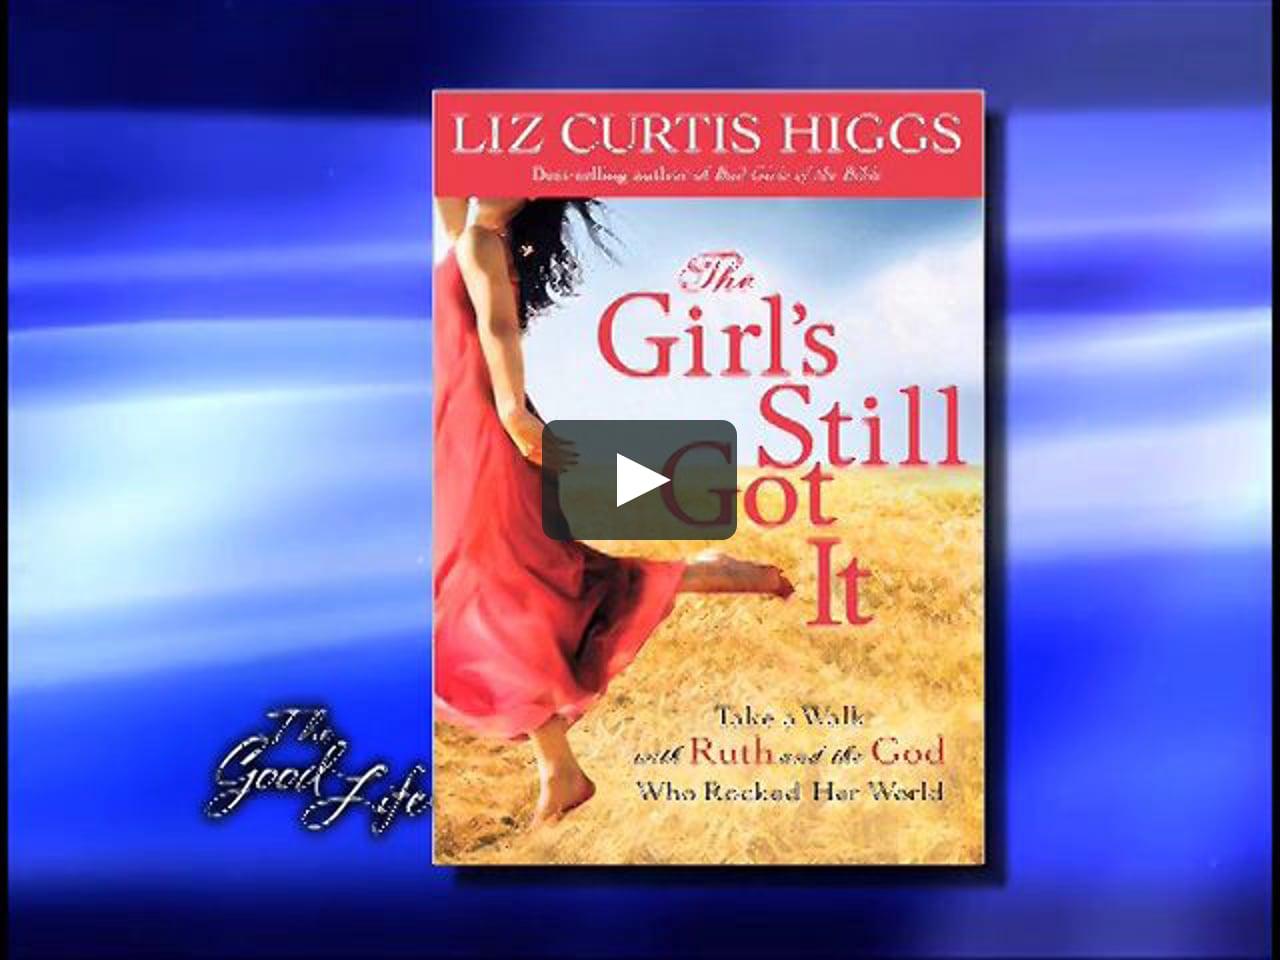 The Good Life Liz Curtis Higgs Ge071912icrs On Vimeo border=